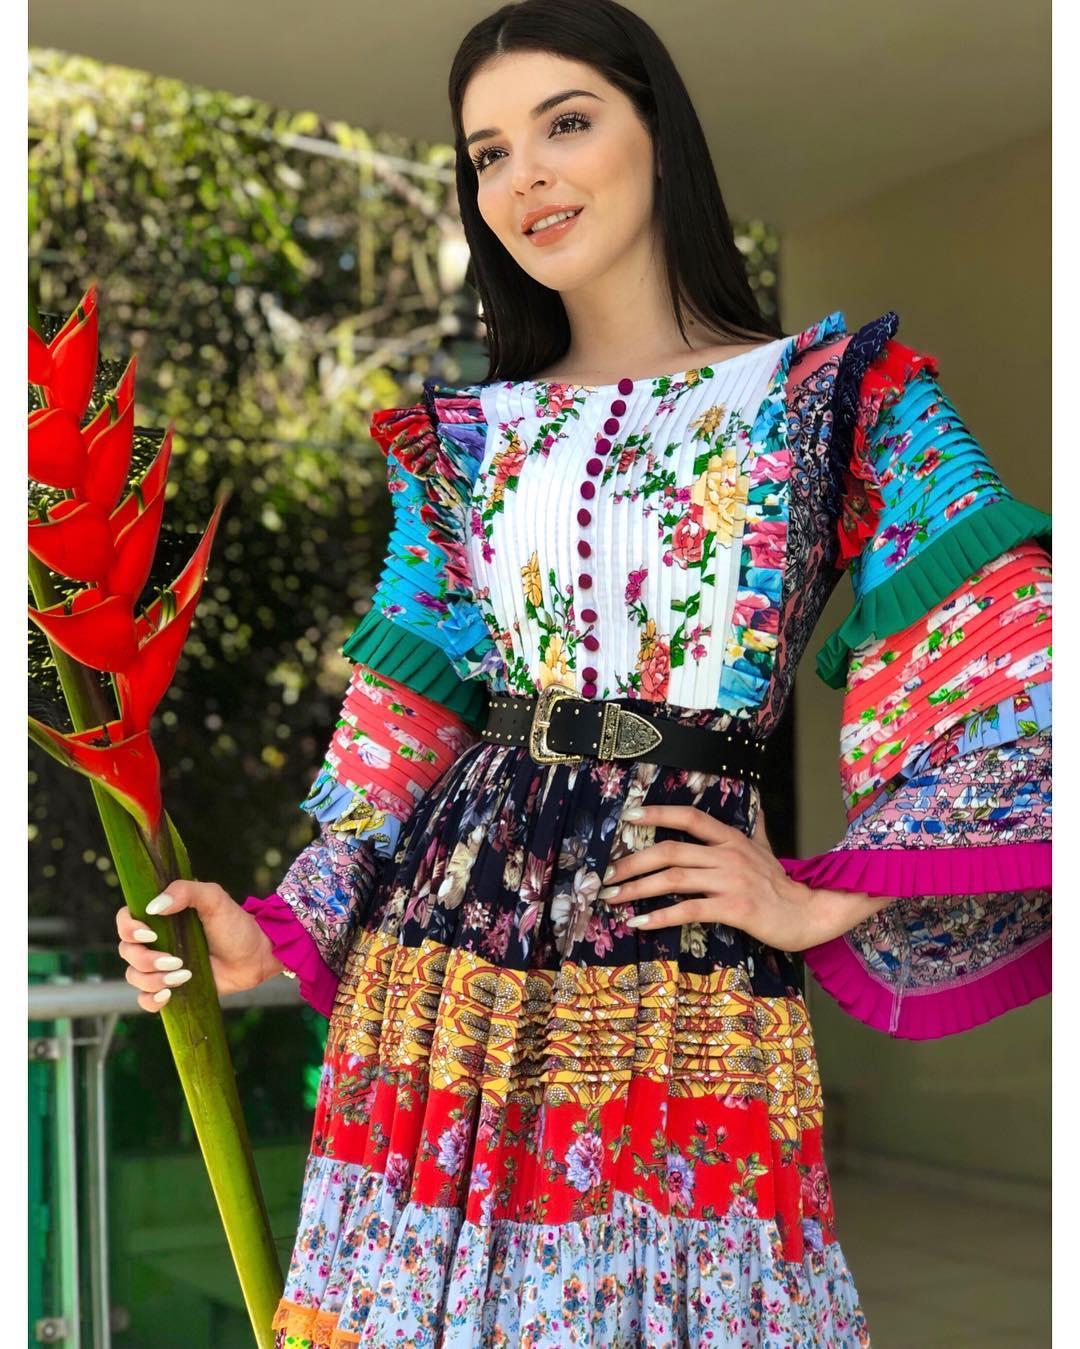 andrea toscano, mexicana universal 2018.  - Página 25 49573713